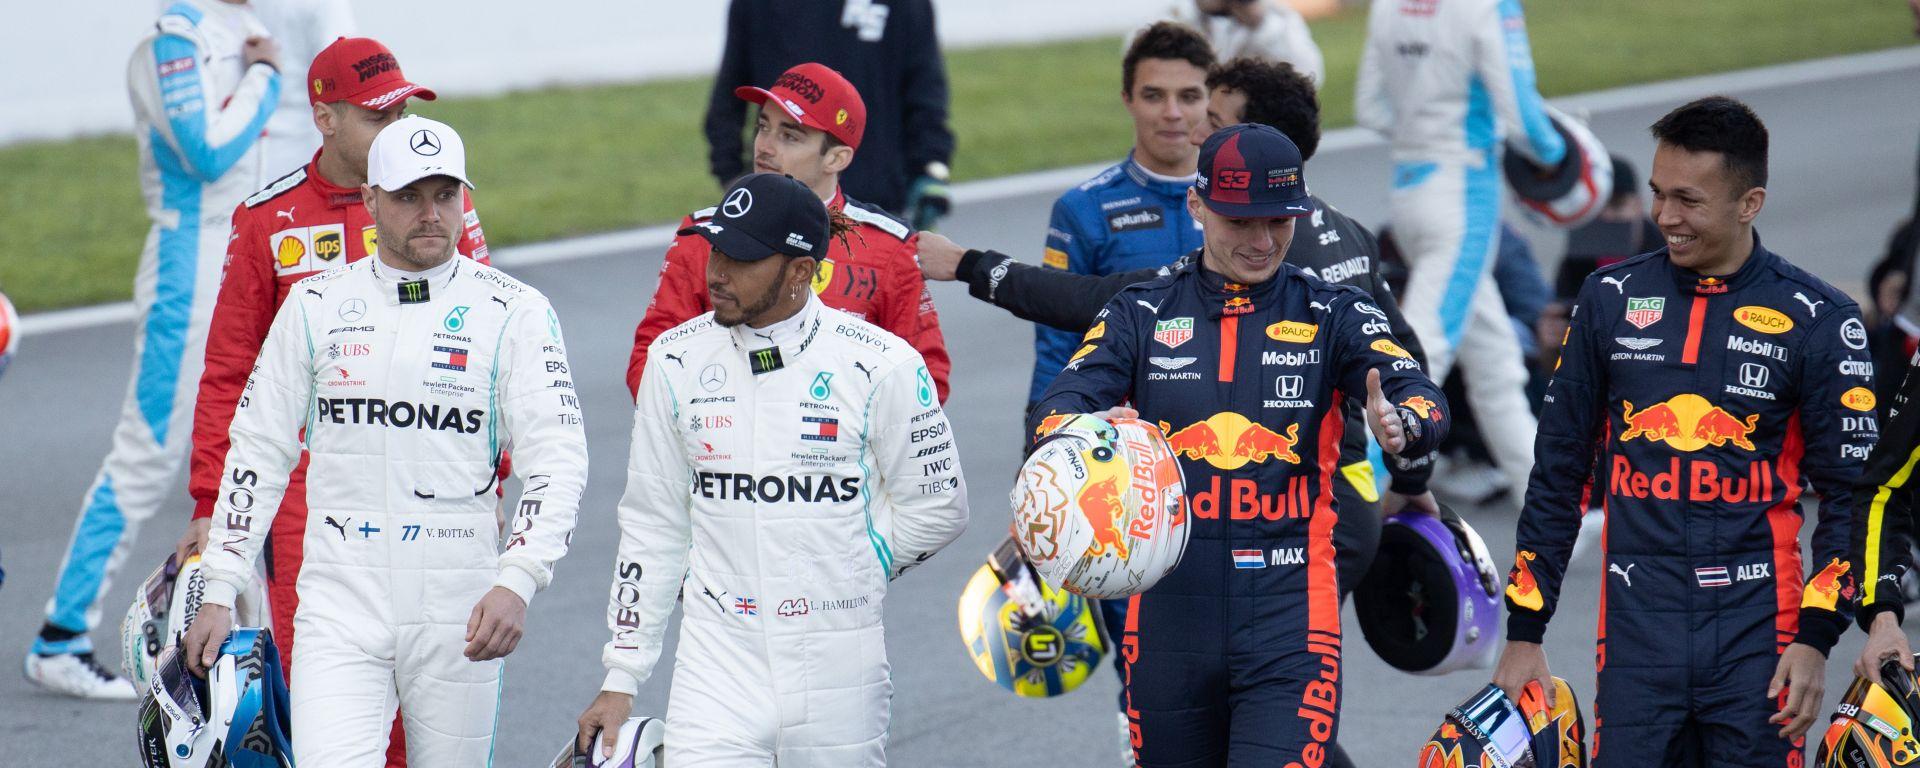 F1 2020: Lewis Hamilton, Valtteri Bottas, Max Verstappen e Alex Albon